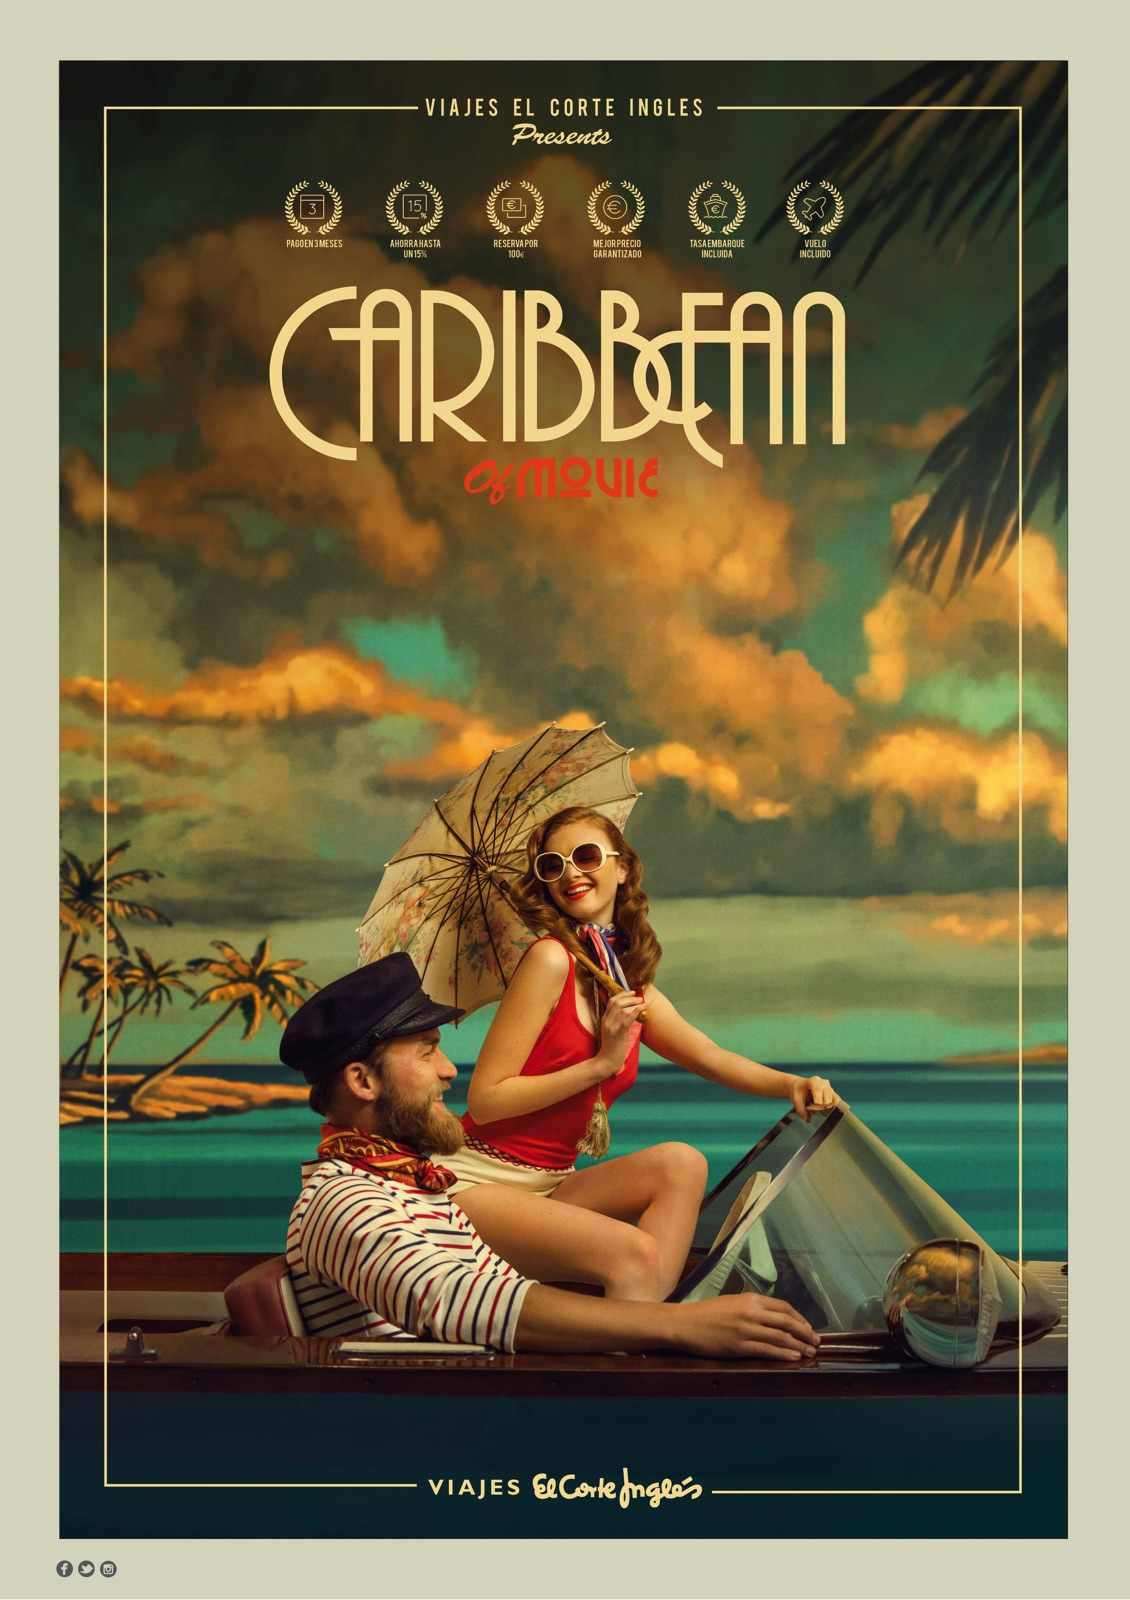 Viajes el Corte Ingles Print Ad - Caribbean of Movie